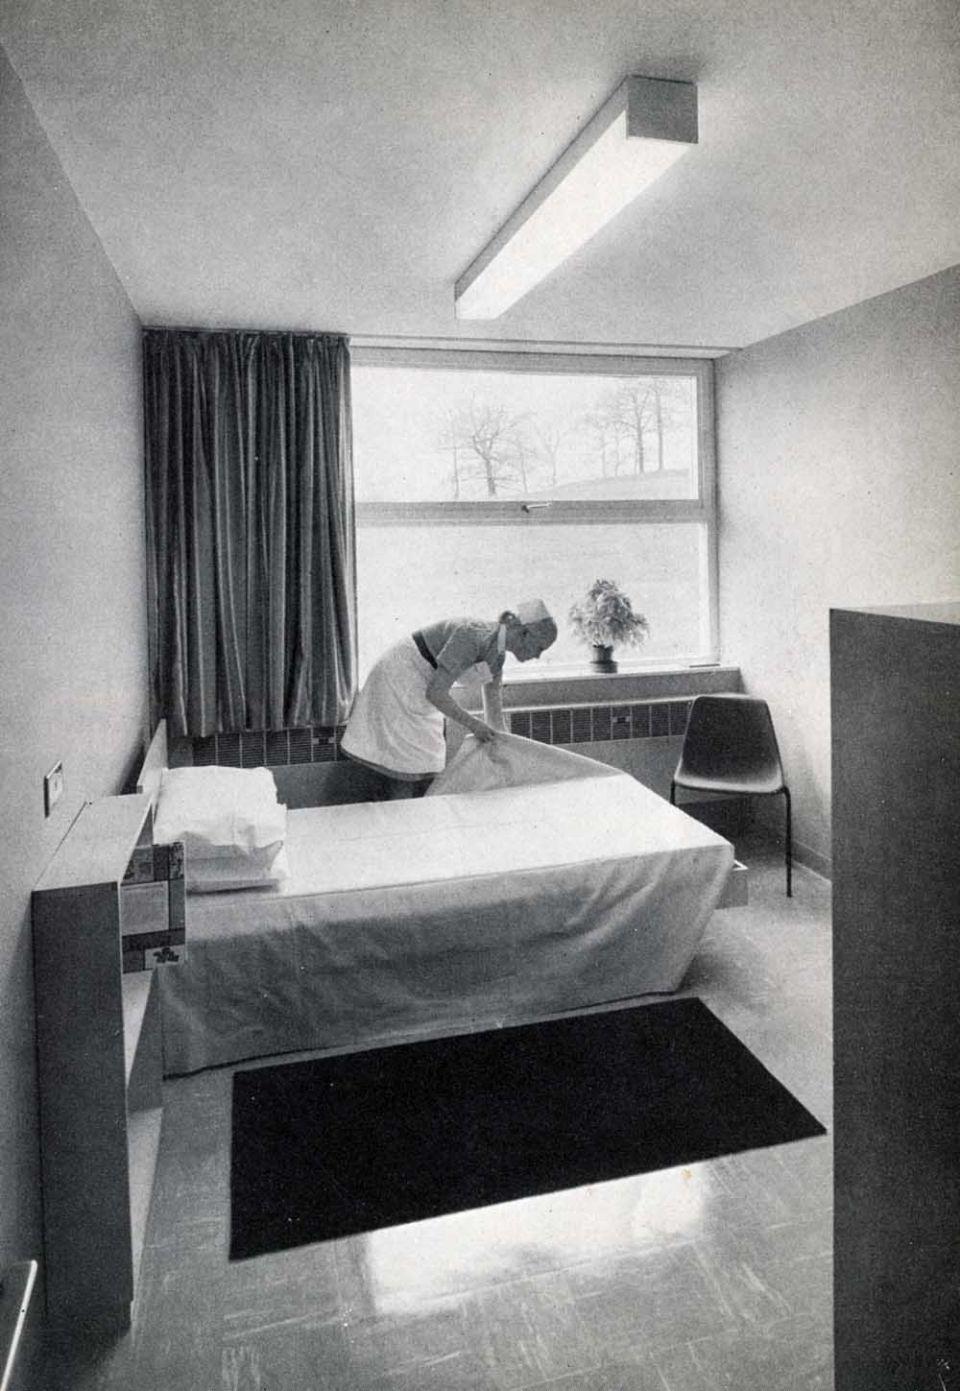 Fieldhead Hospital Wakefield